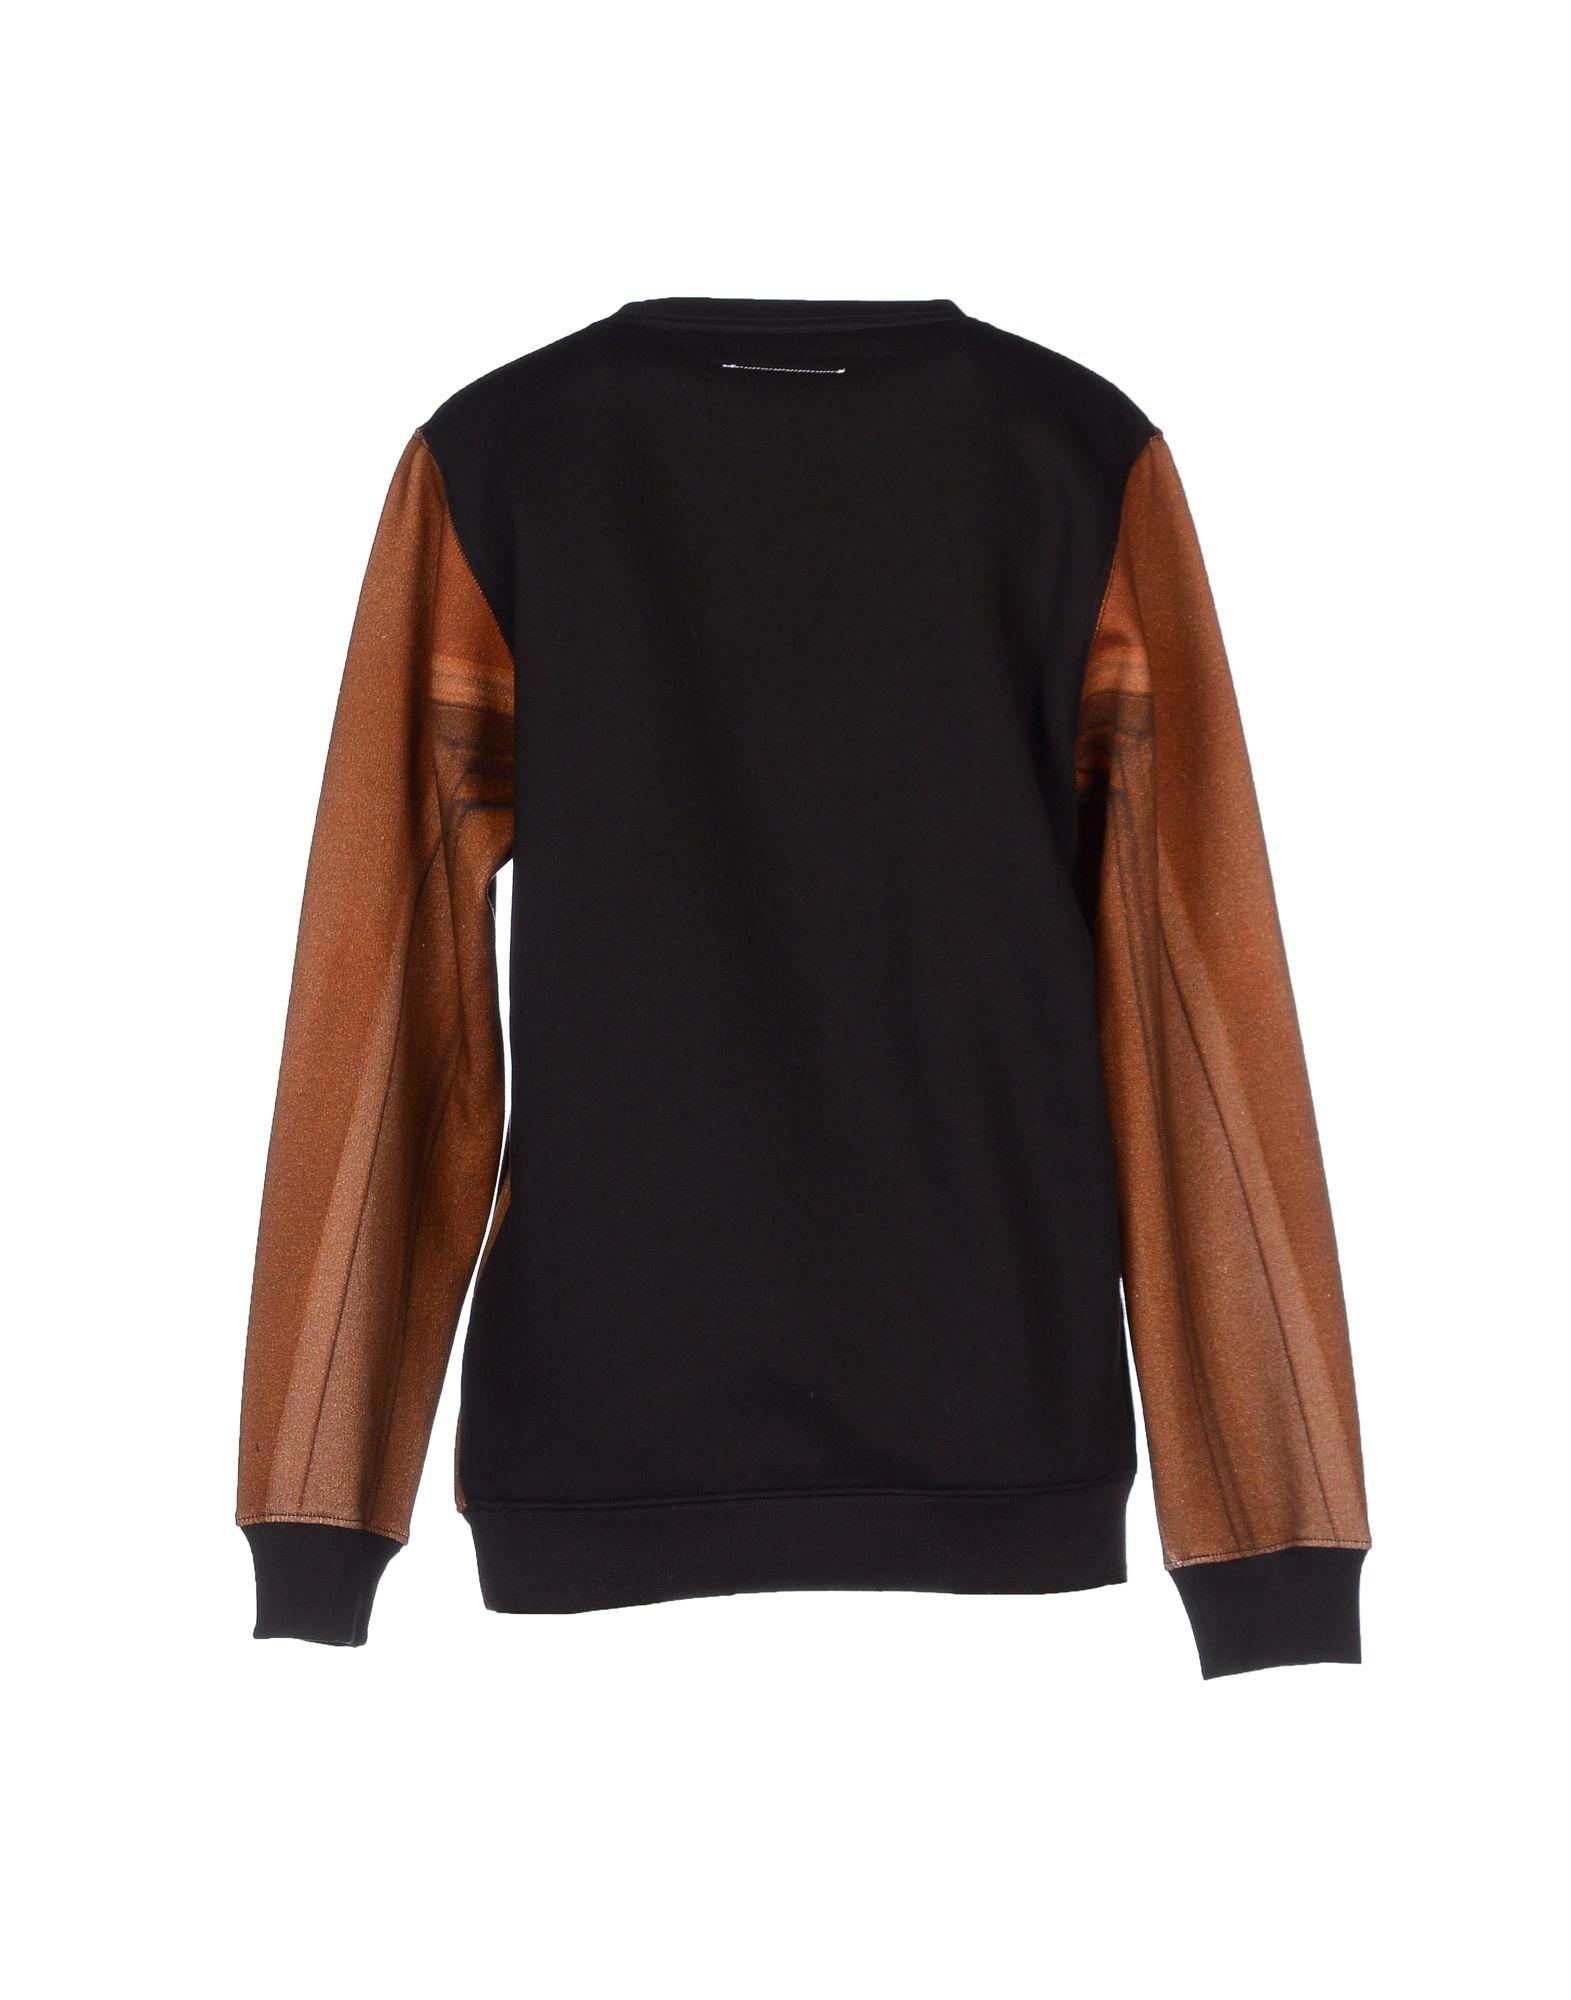 Lyst mm6 by maison martin margiela sweatshirt in brown for Mm6 maison martin margiela